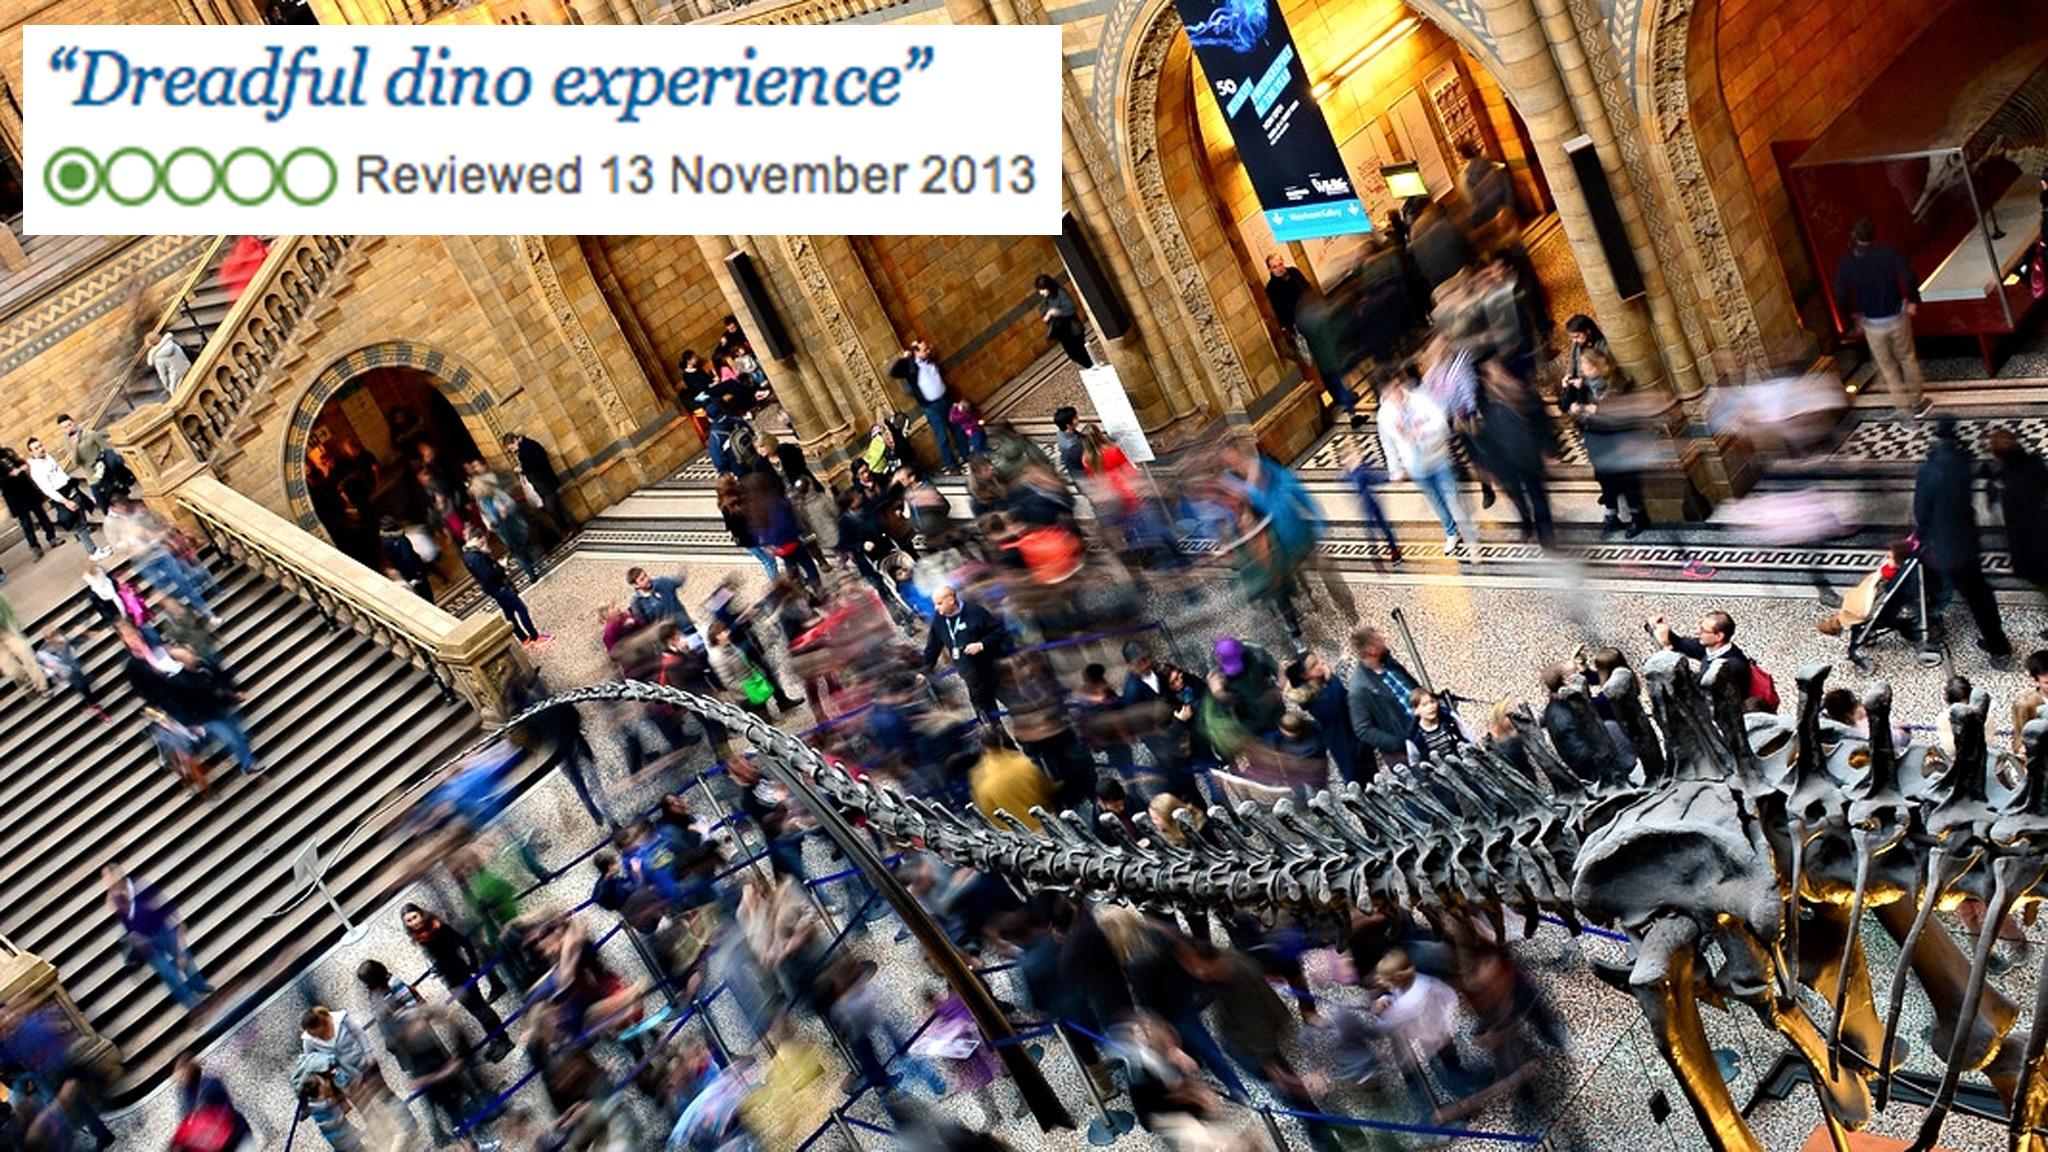 Natural History Museum TripAdvisor review